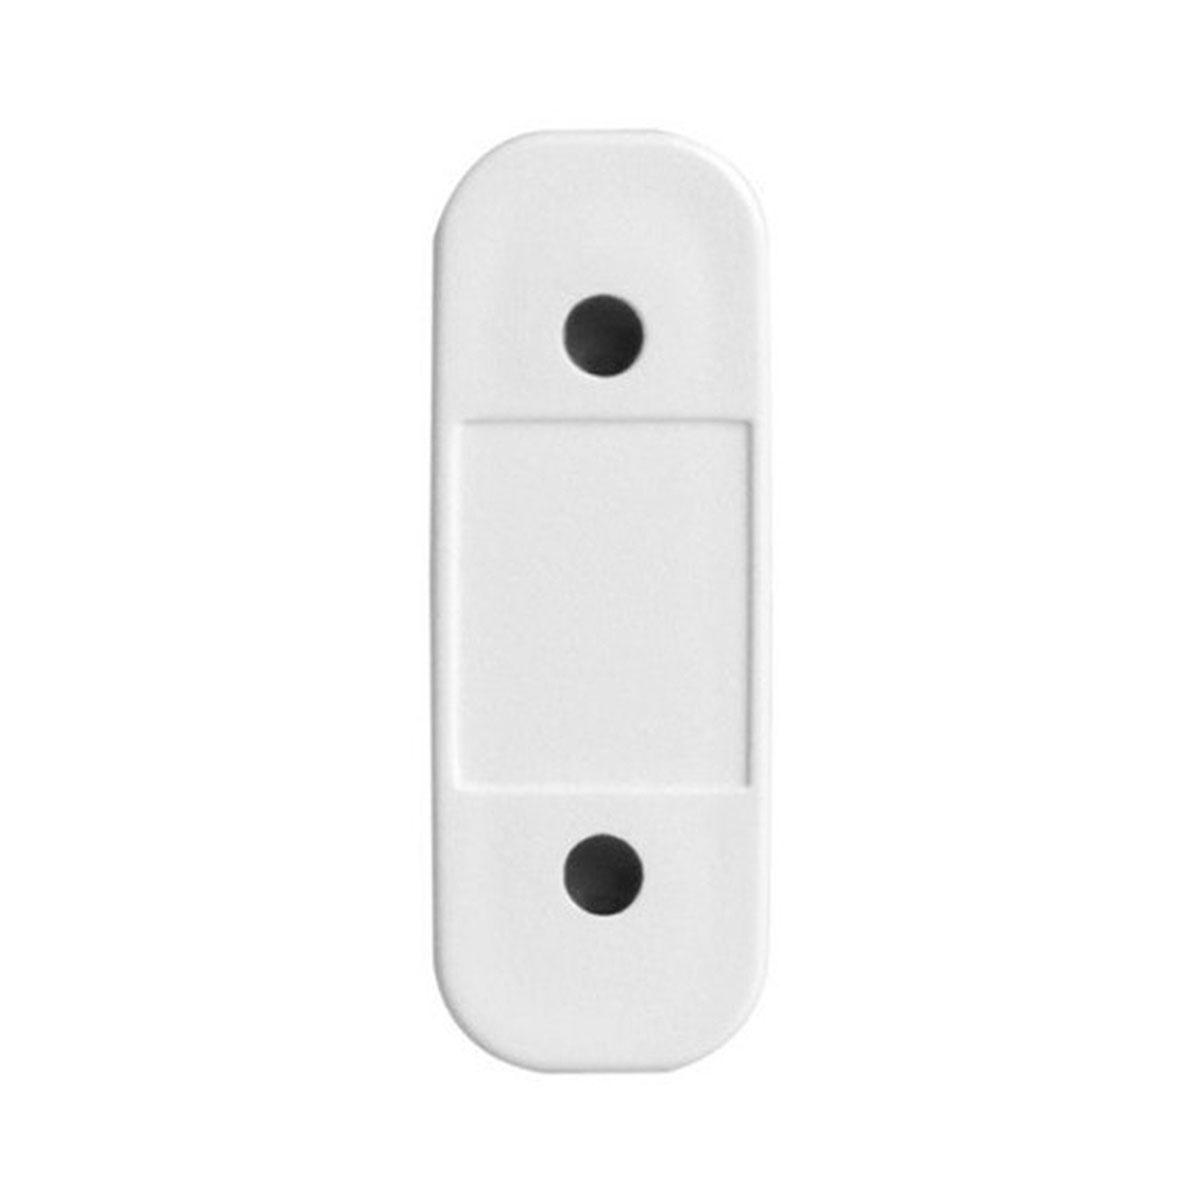 Kit 06 Sensor Magnético Intelbras Sem Fio Xas Smart Branco